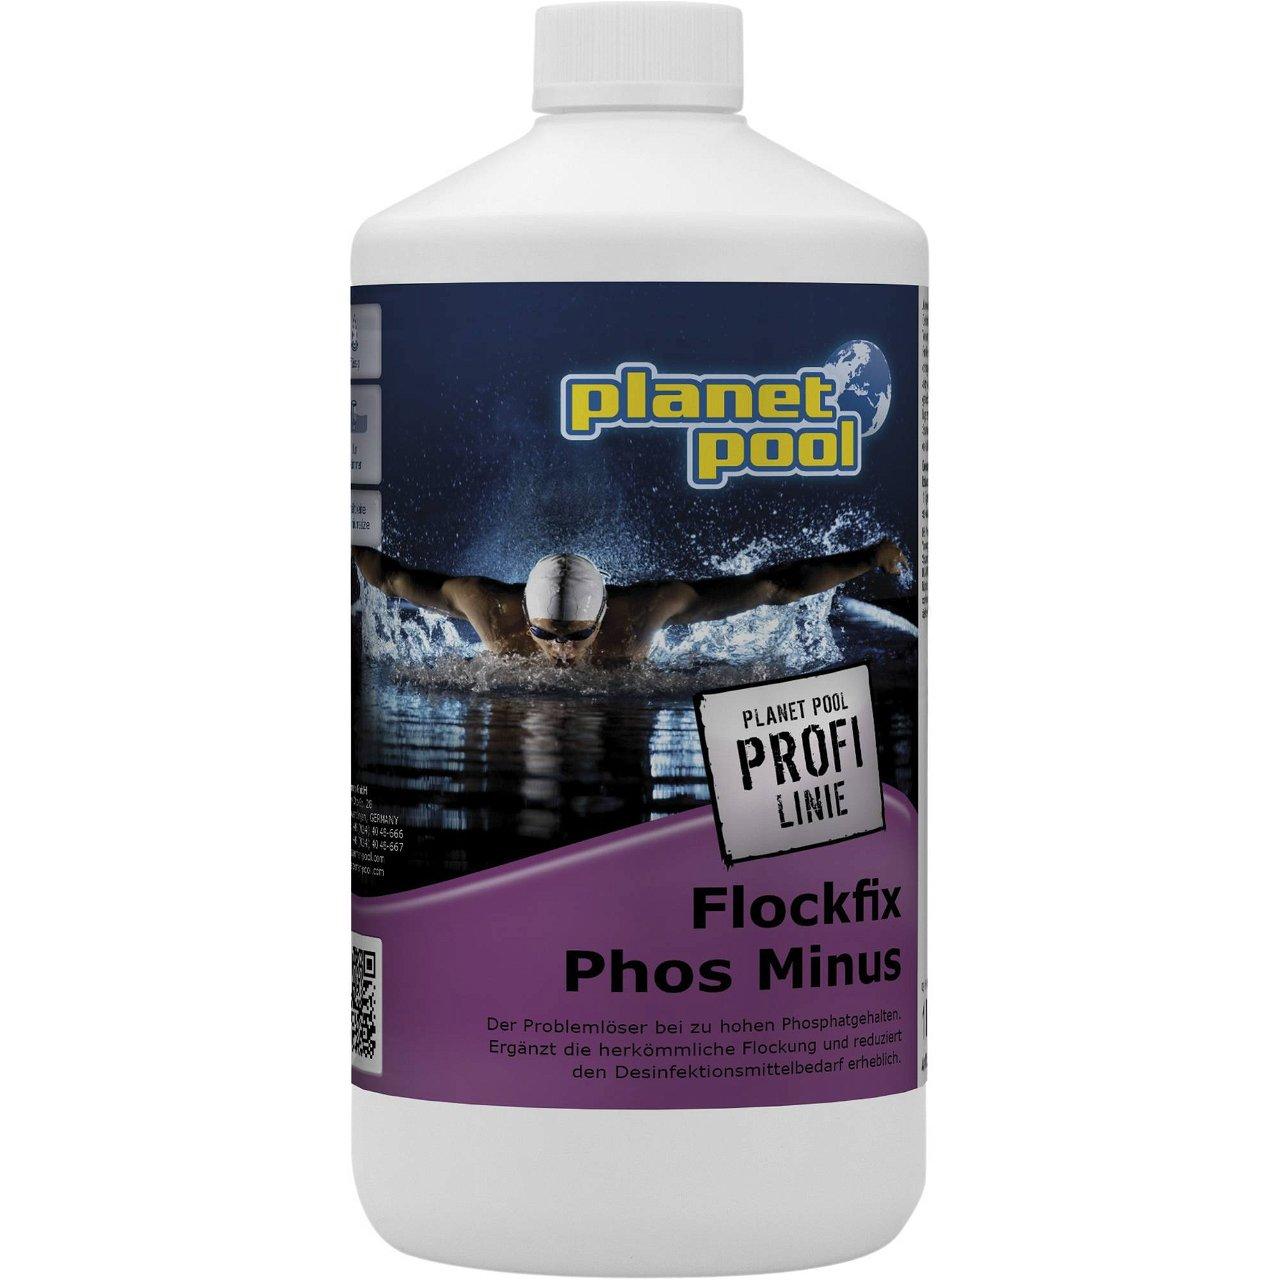 PLANET POOL - Profi Linie | Flockfix Phos Minus 1 Liter